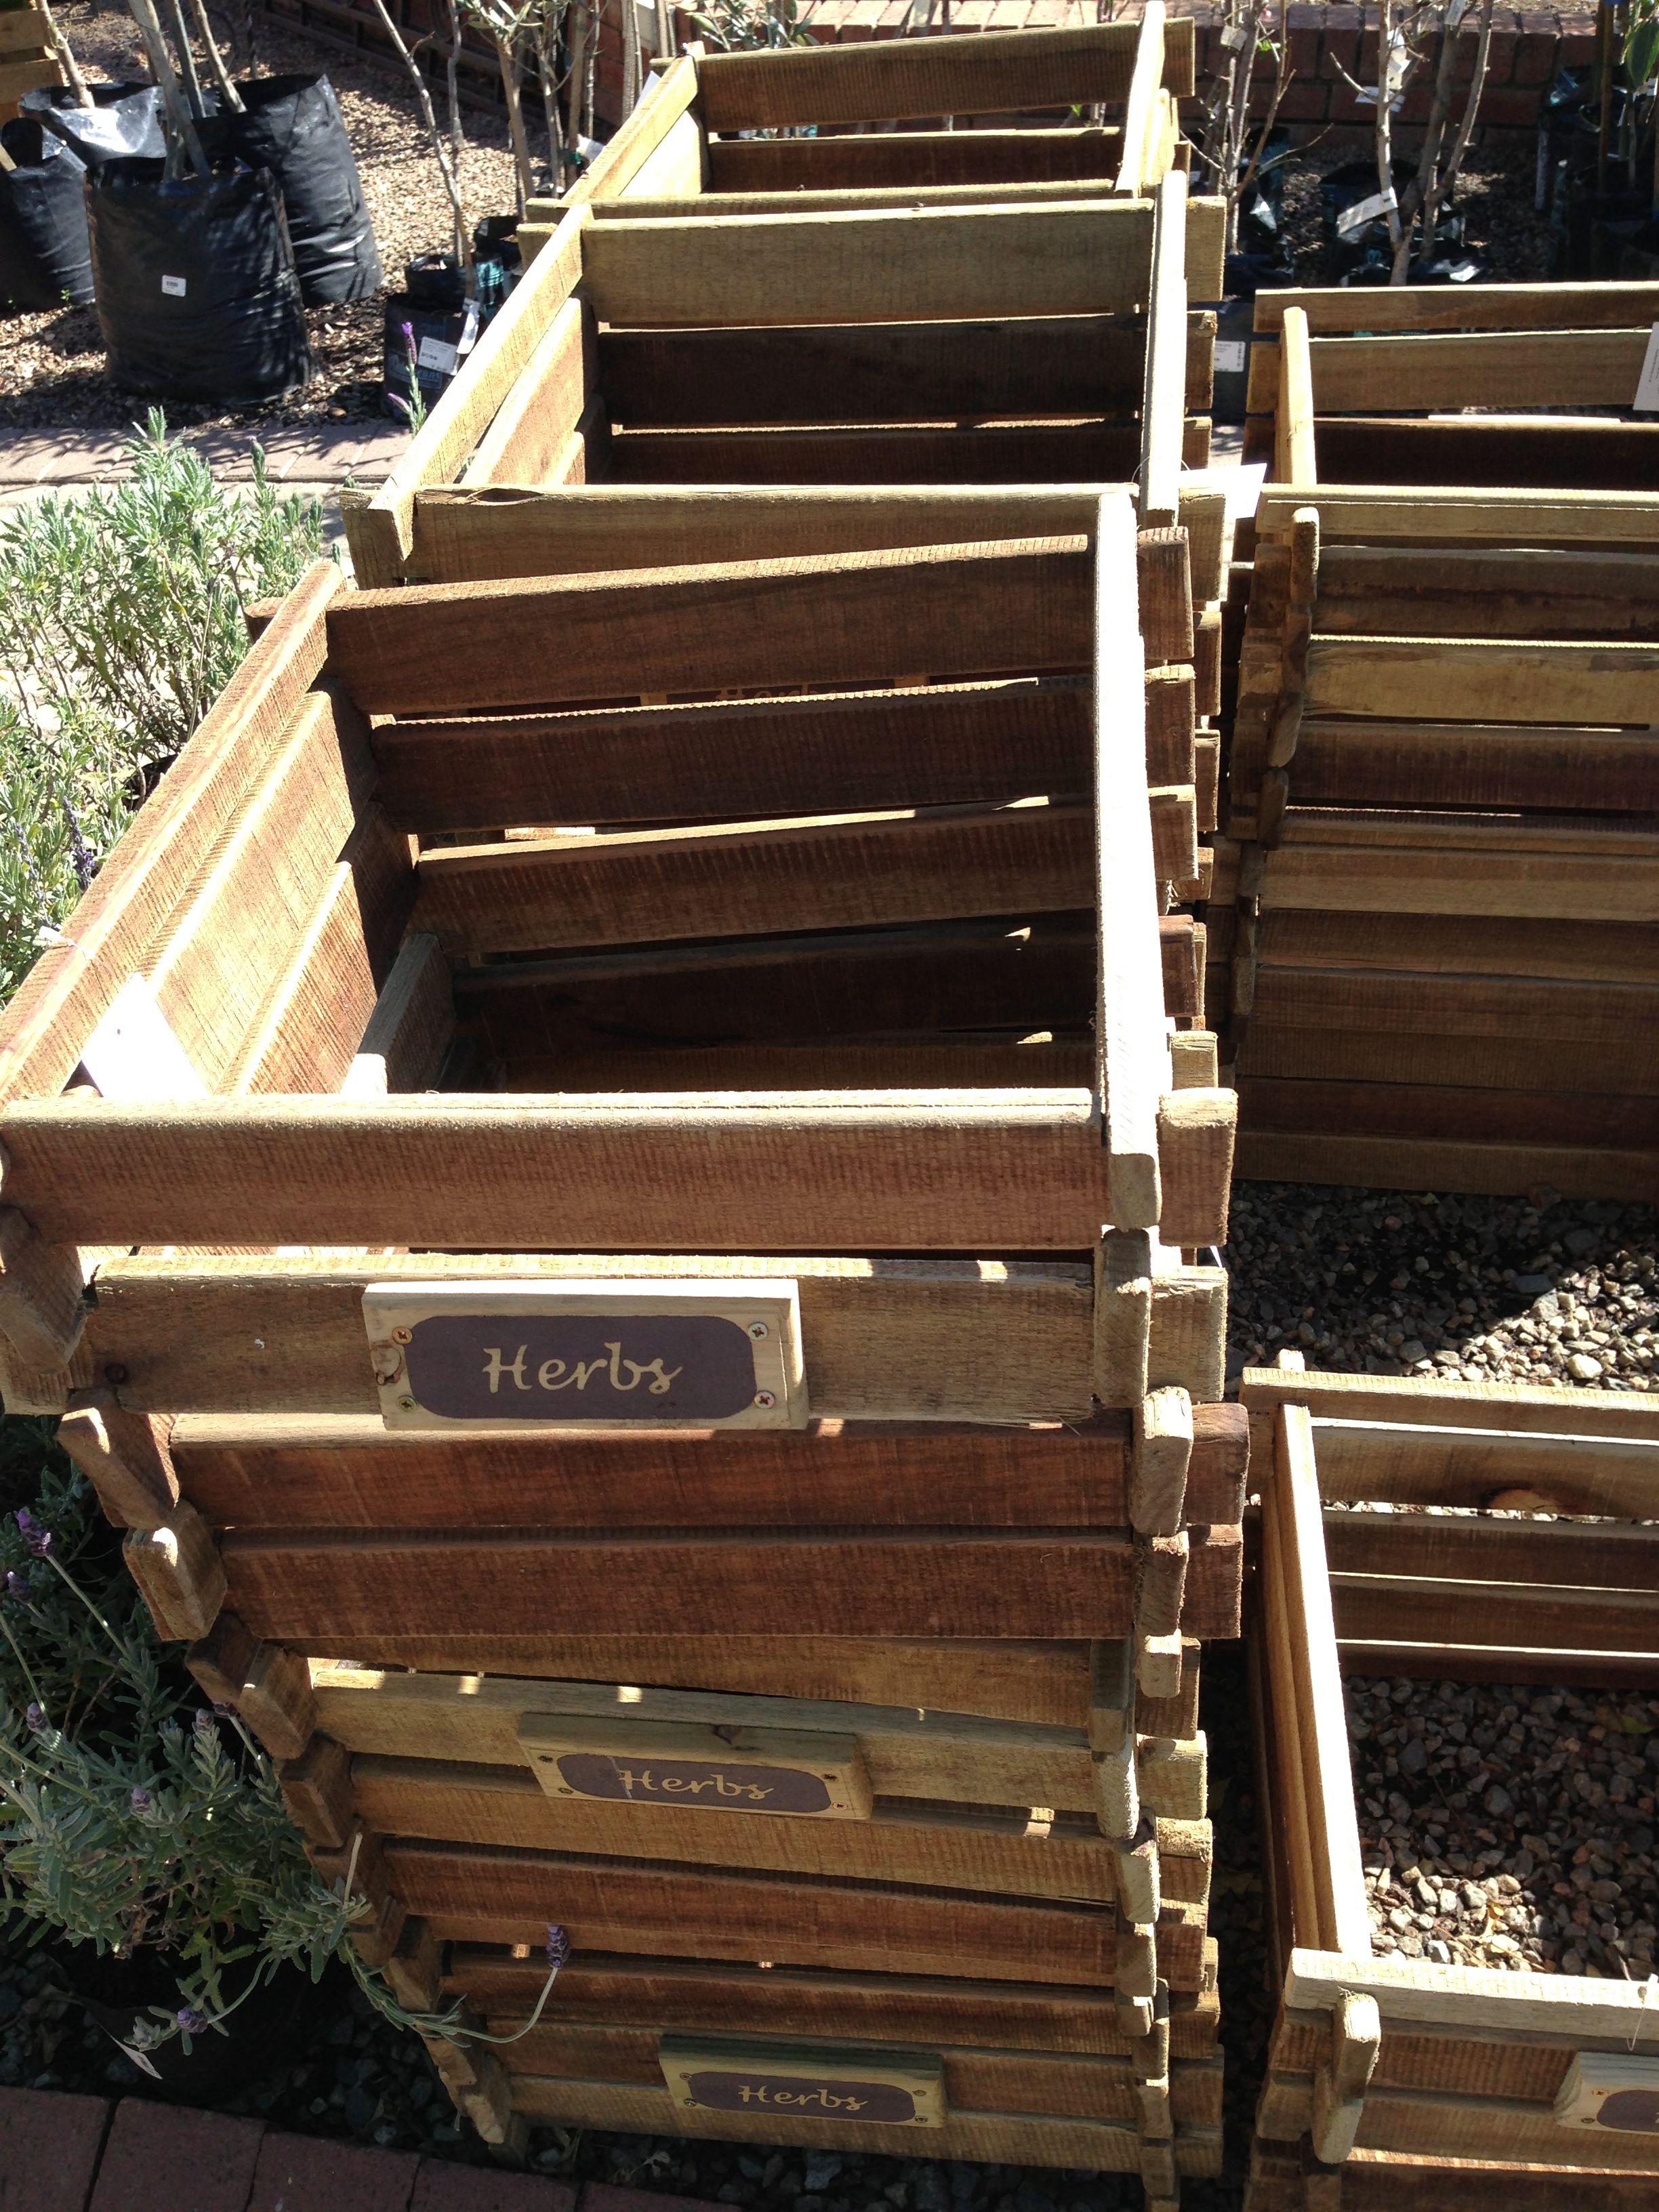 Veggie garden (With images) | Diy decor, Veggie garden, Wood